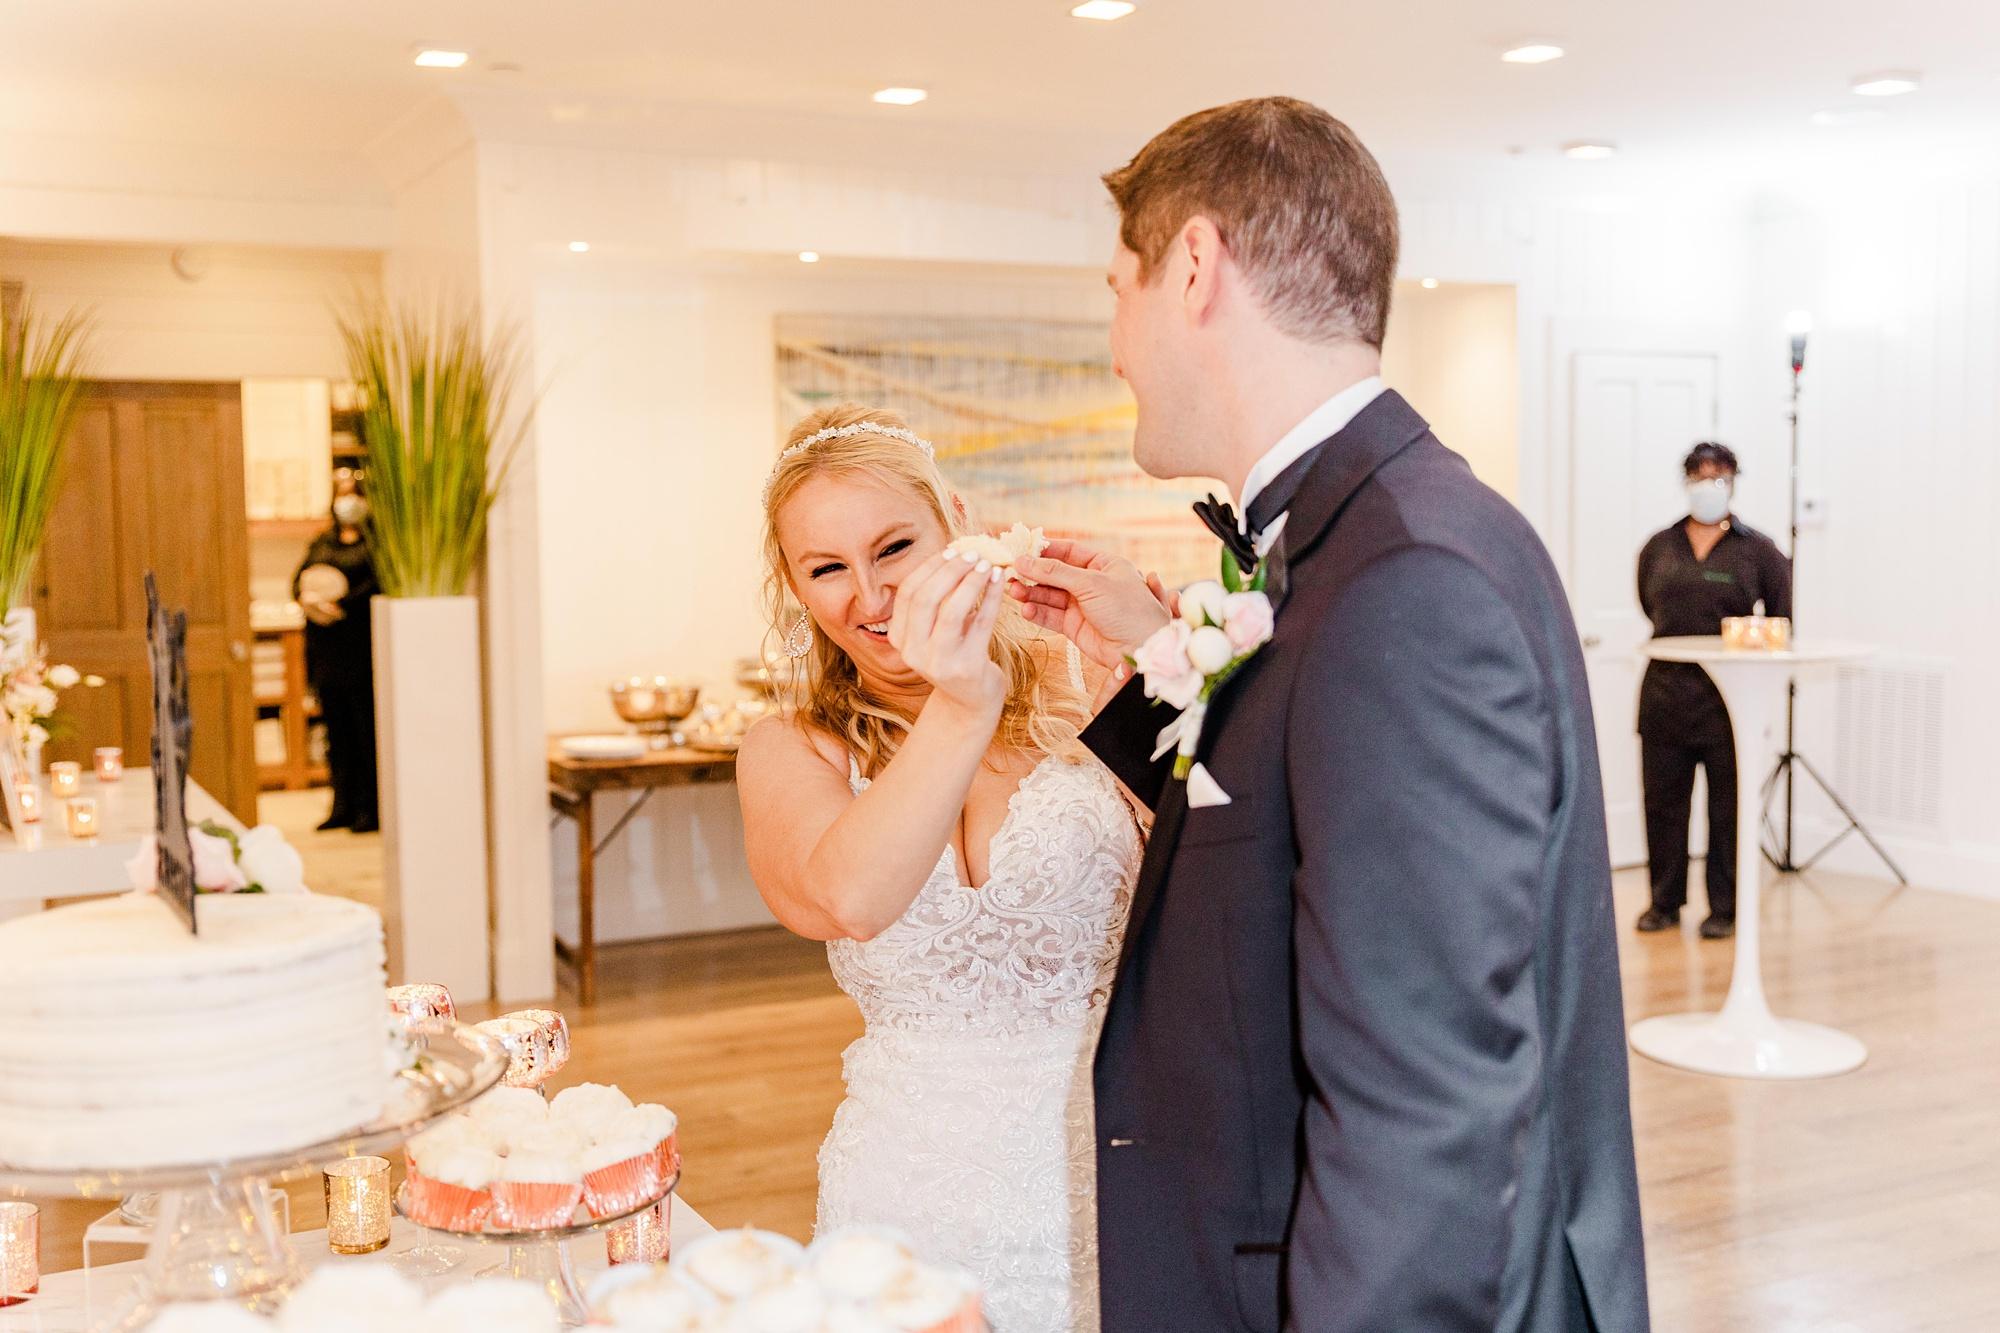 Fairhope AL wedding reception cake cutting for bride and groom